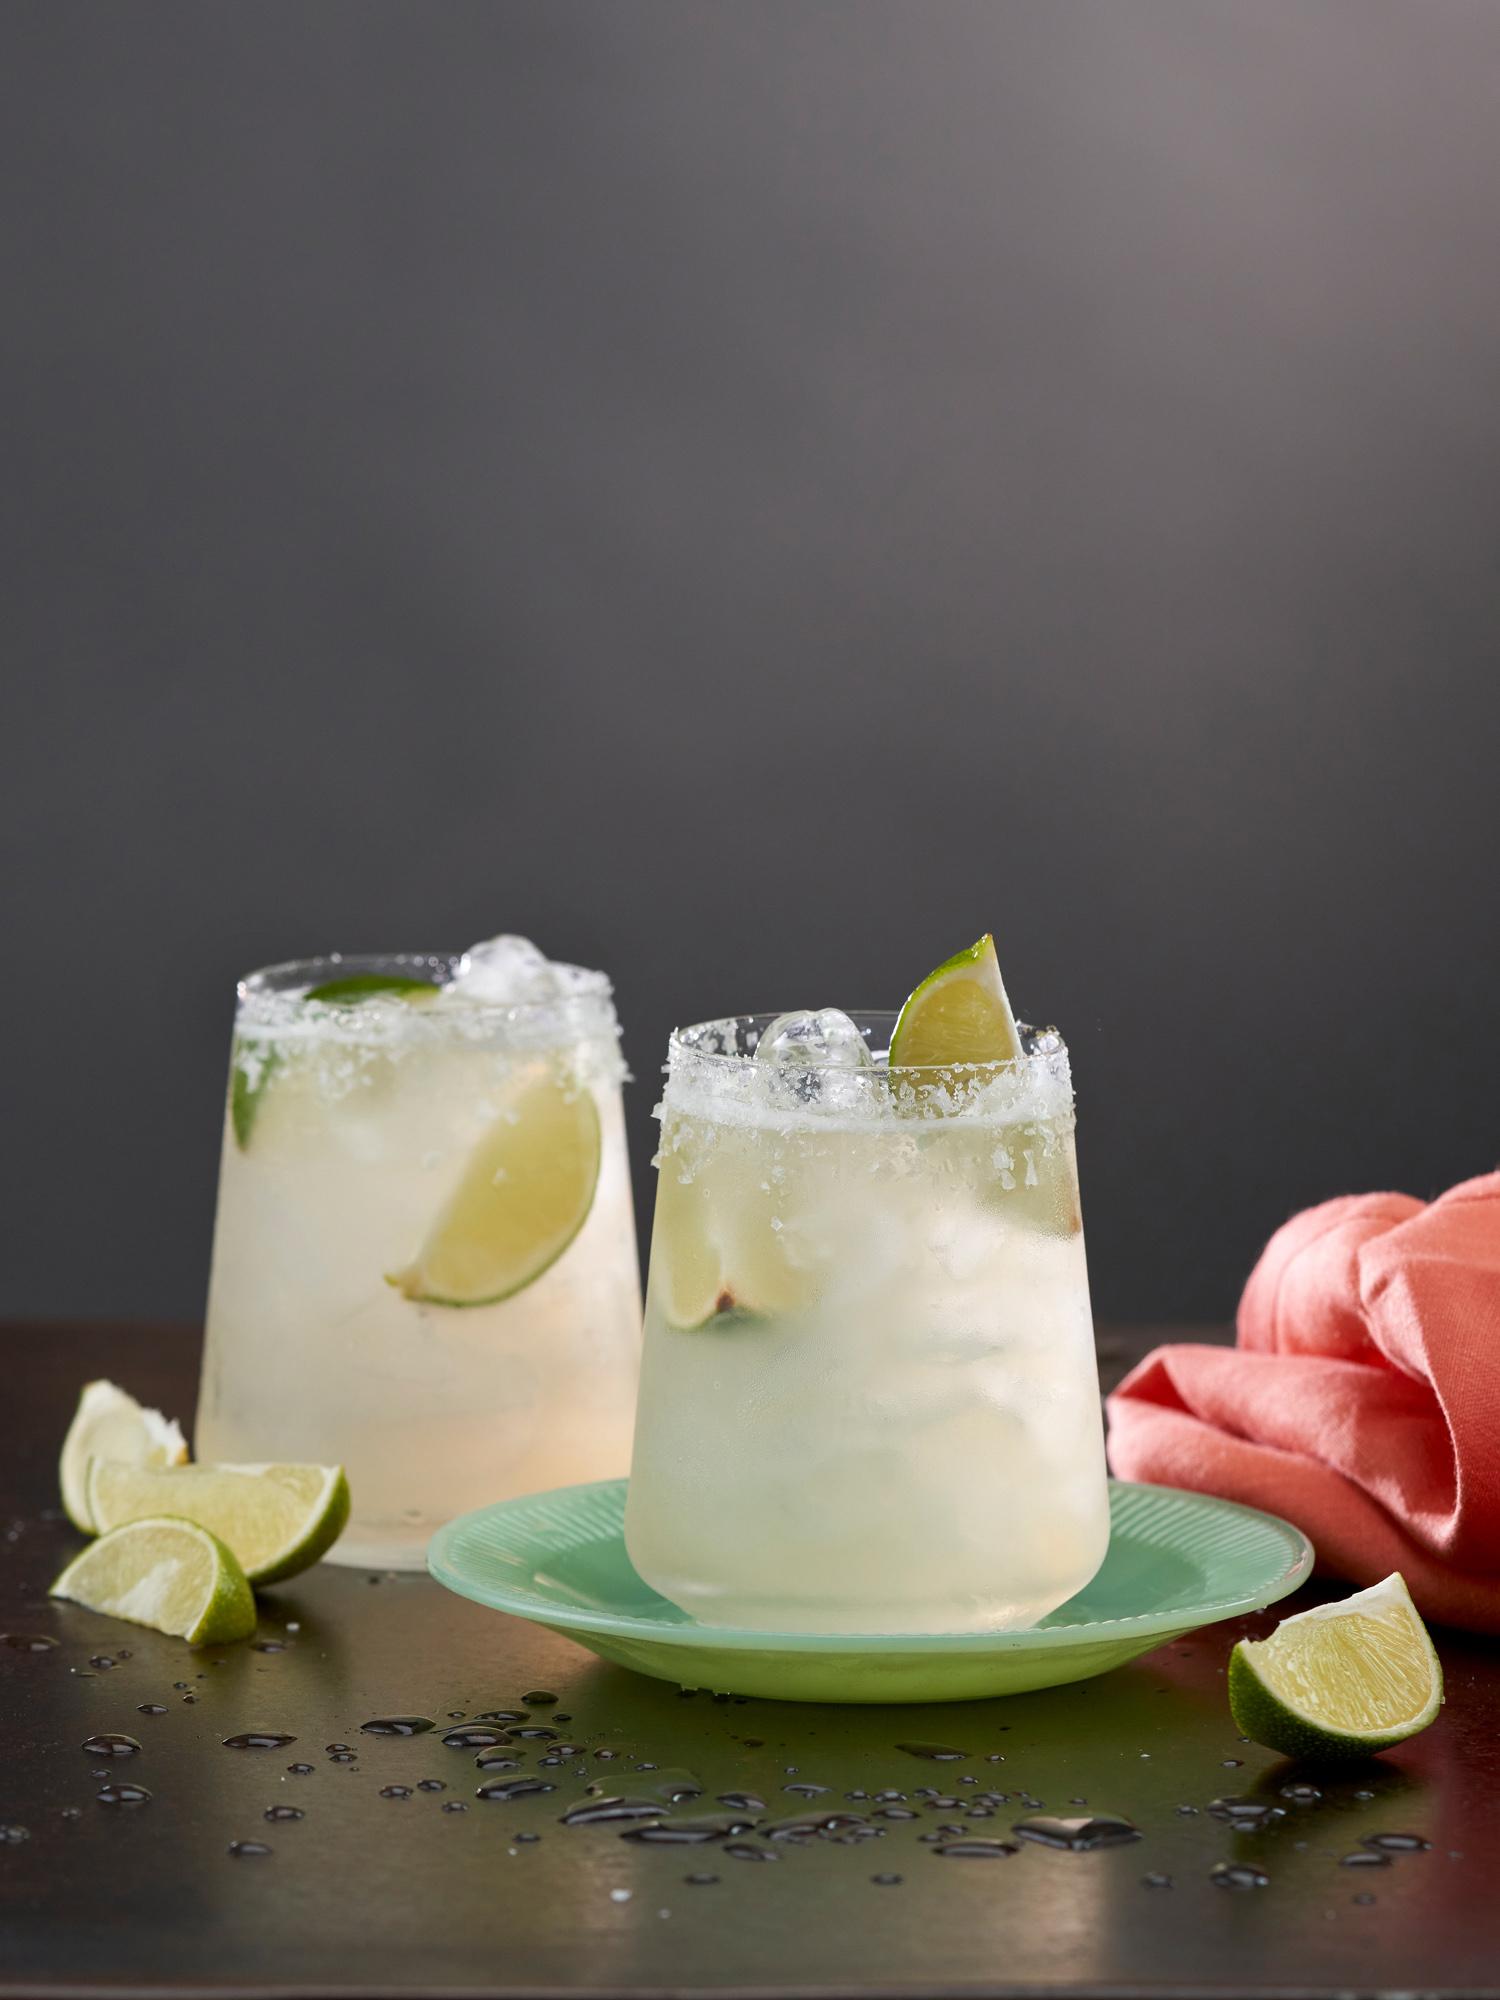 The best Margarita in the world